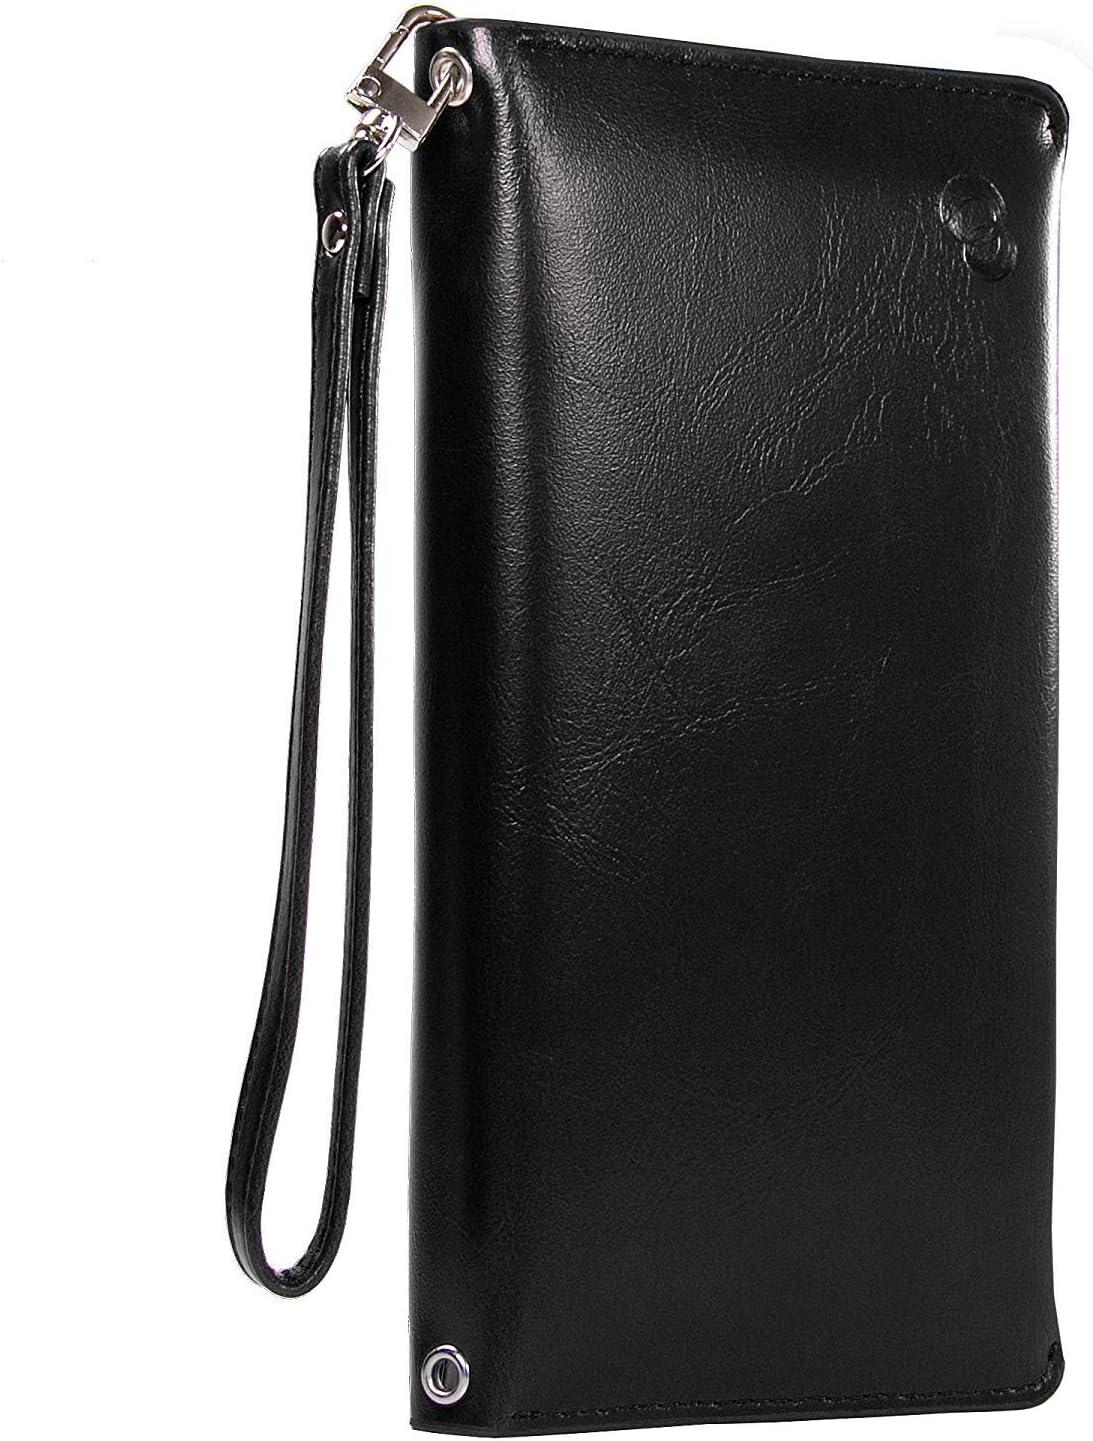 PU Leather Travel Bag Purse Wallet Document Organiser ID Passport Ticket Holder